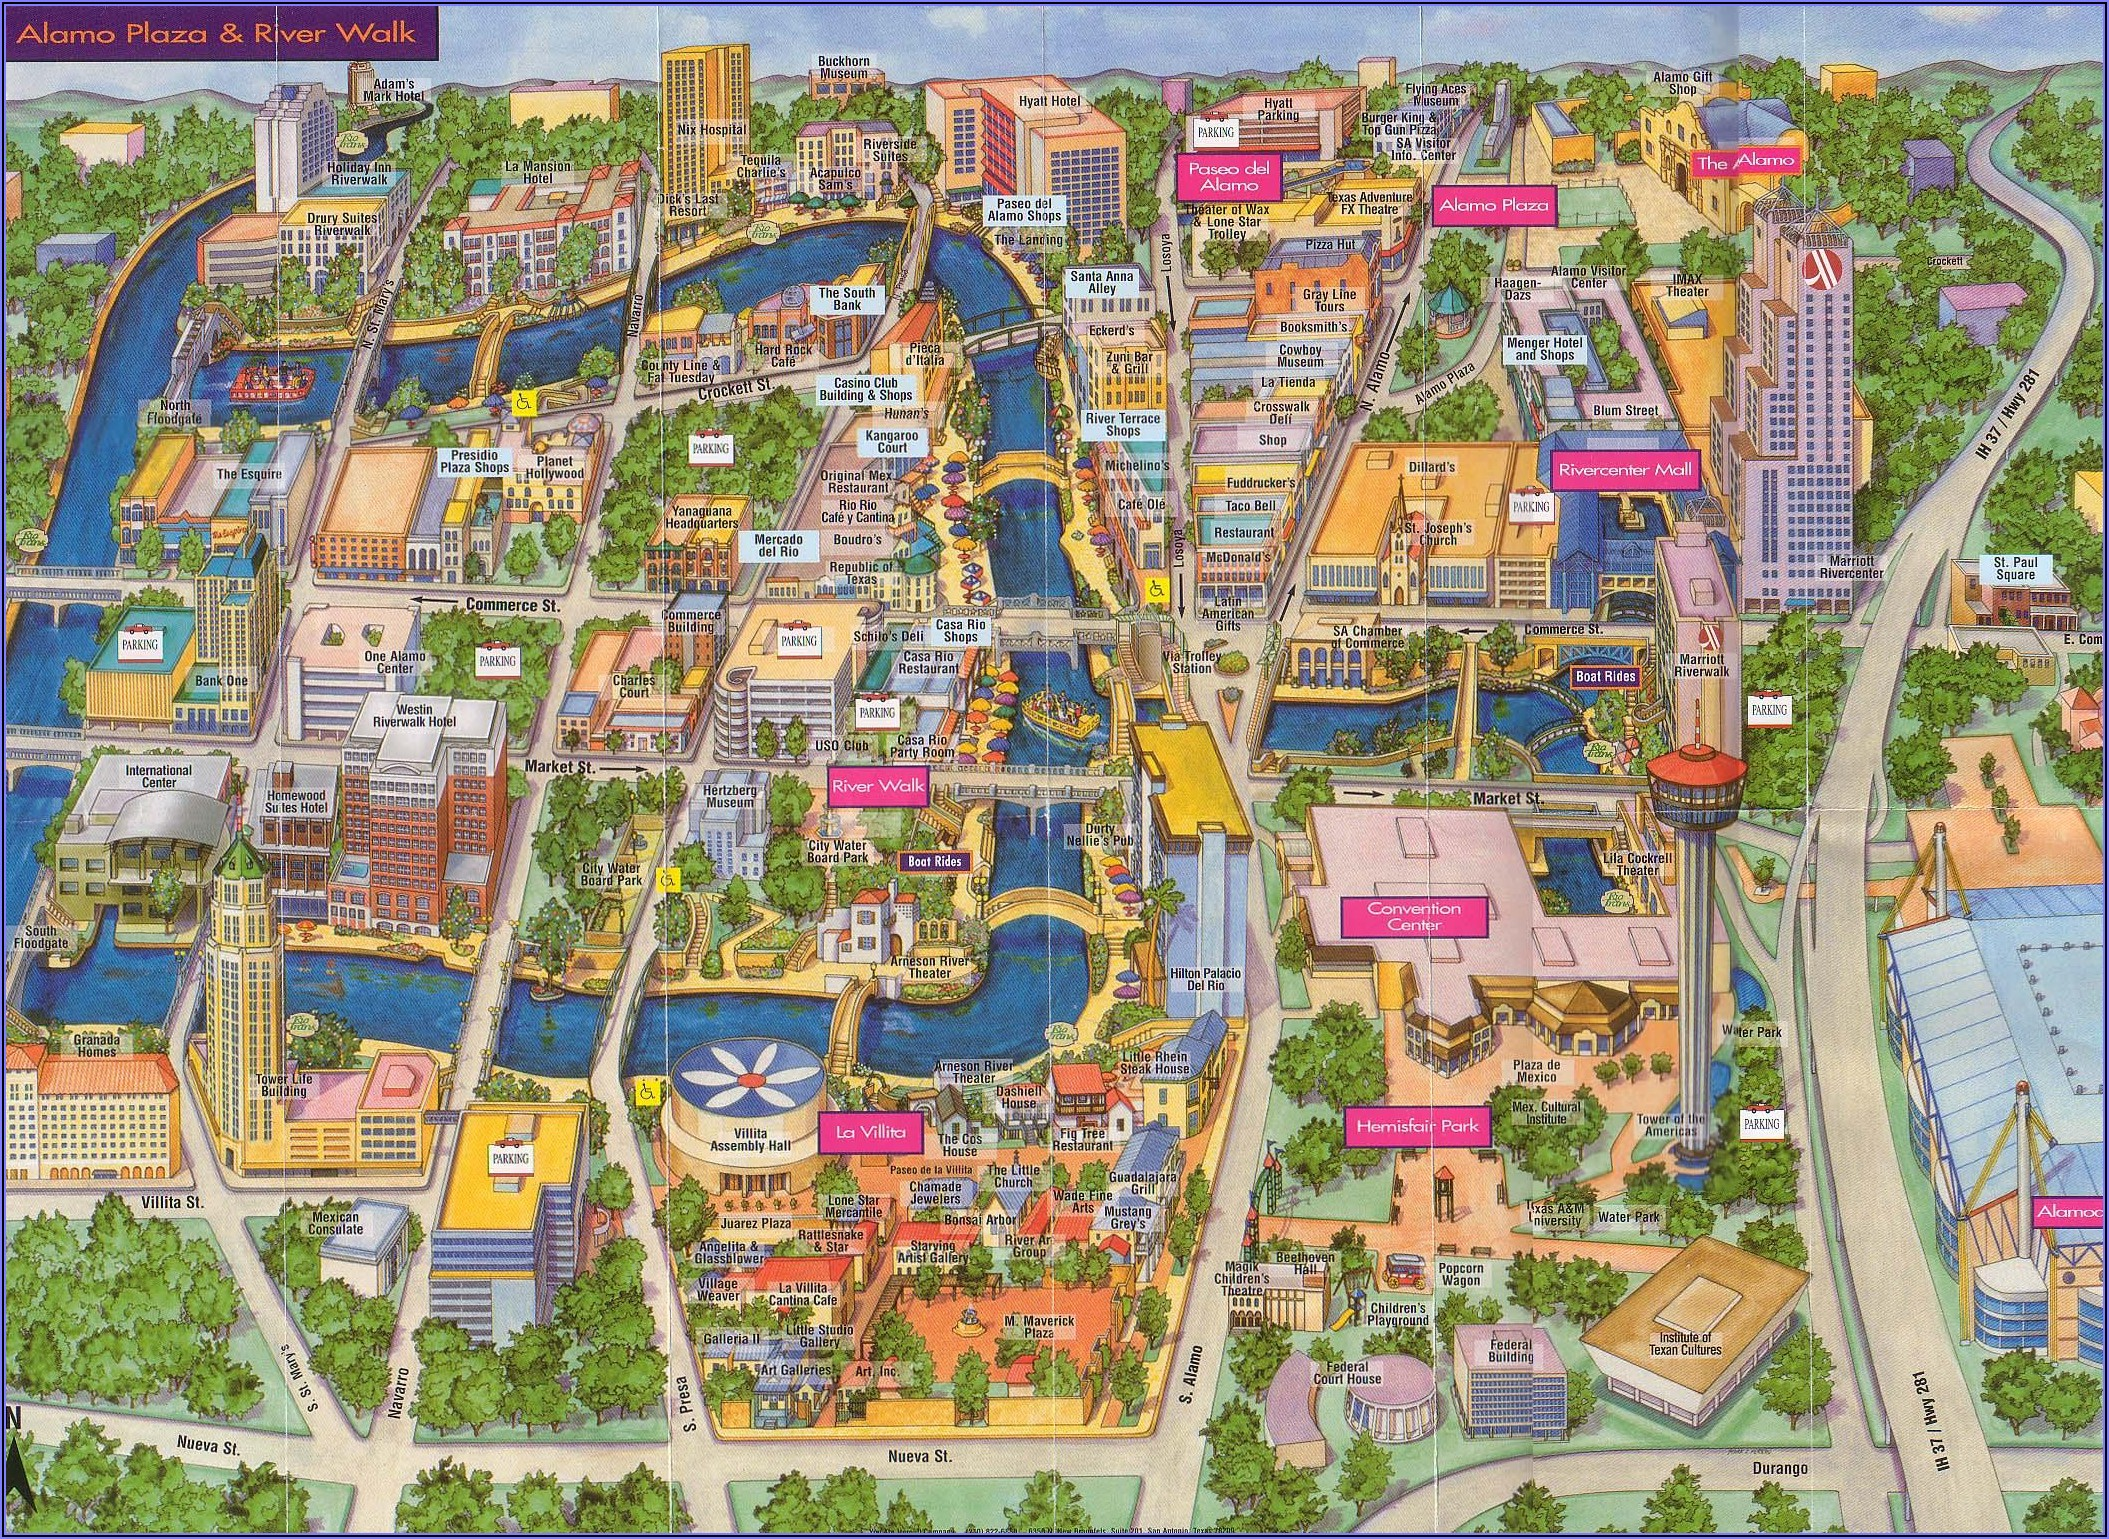 San Antonio Riverwalk Google Maps